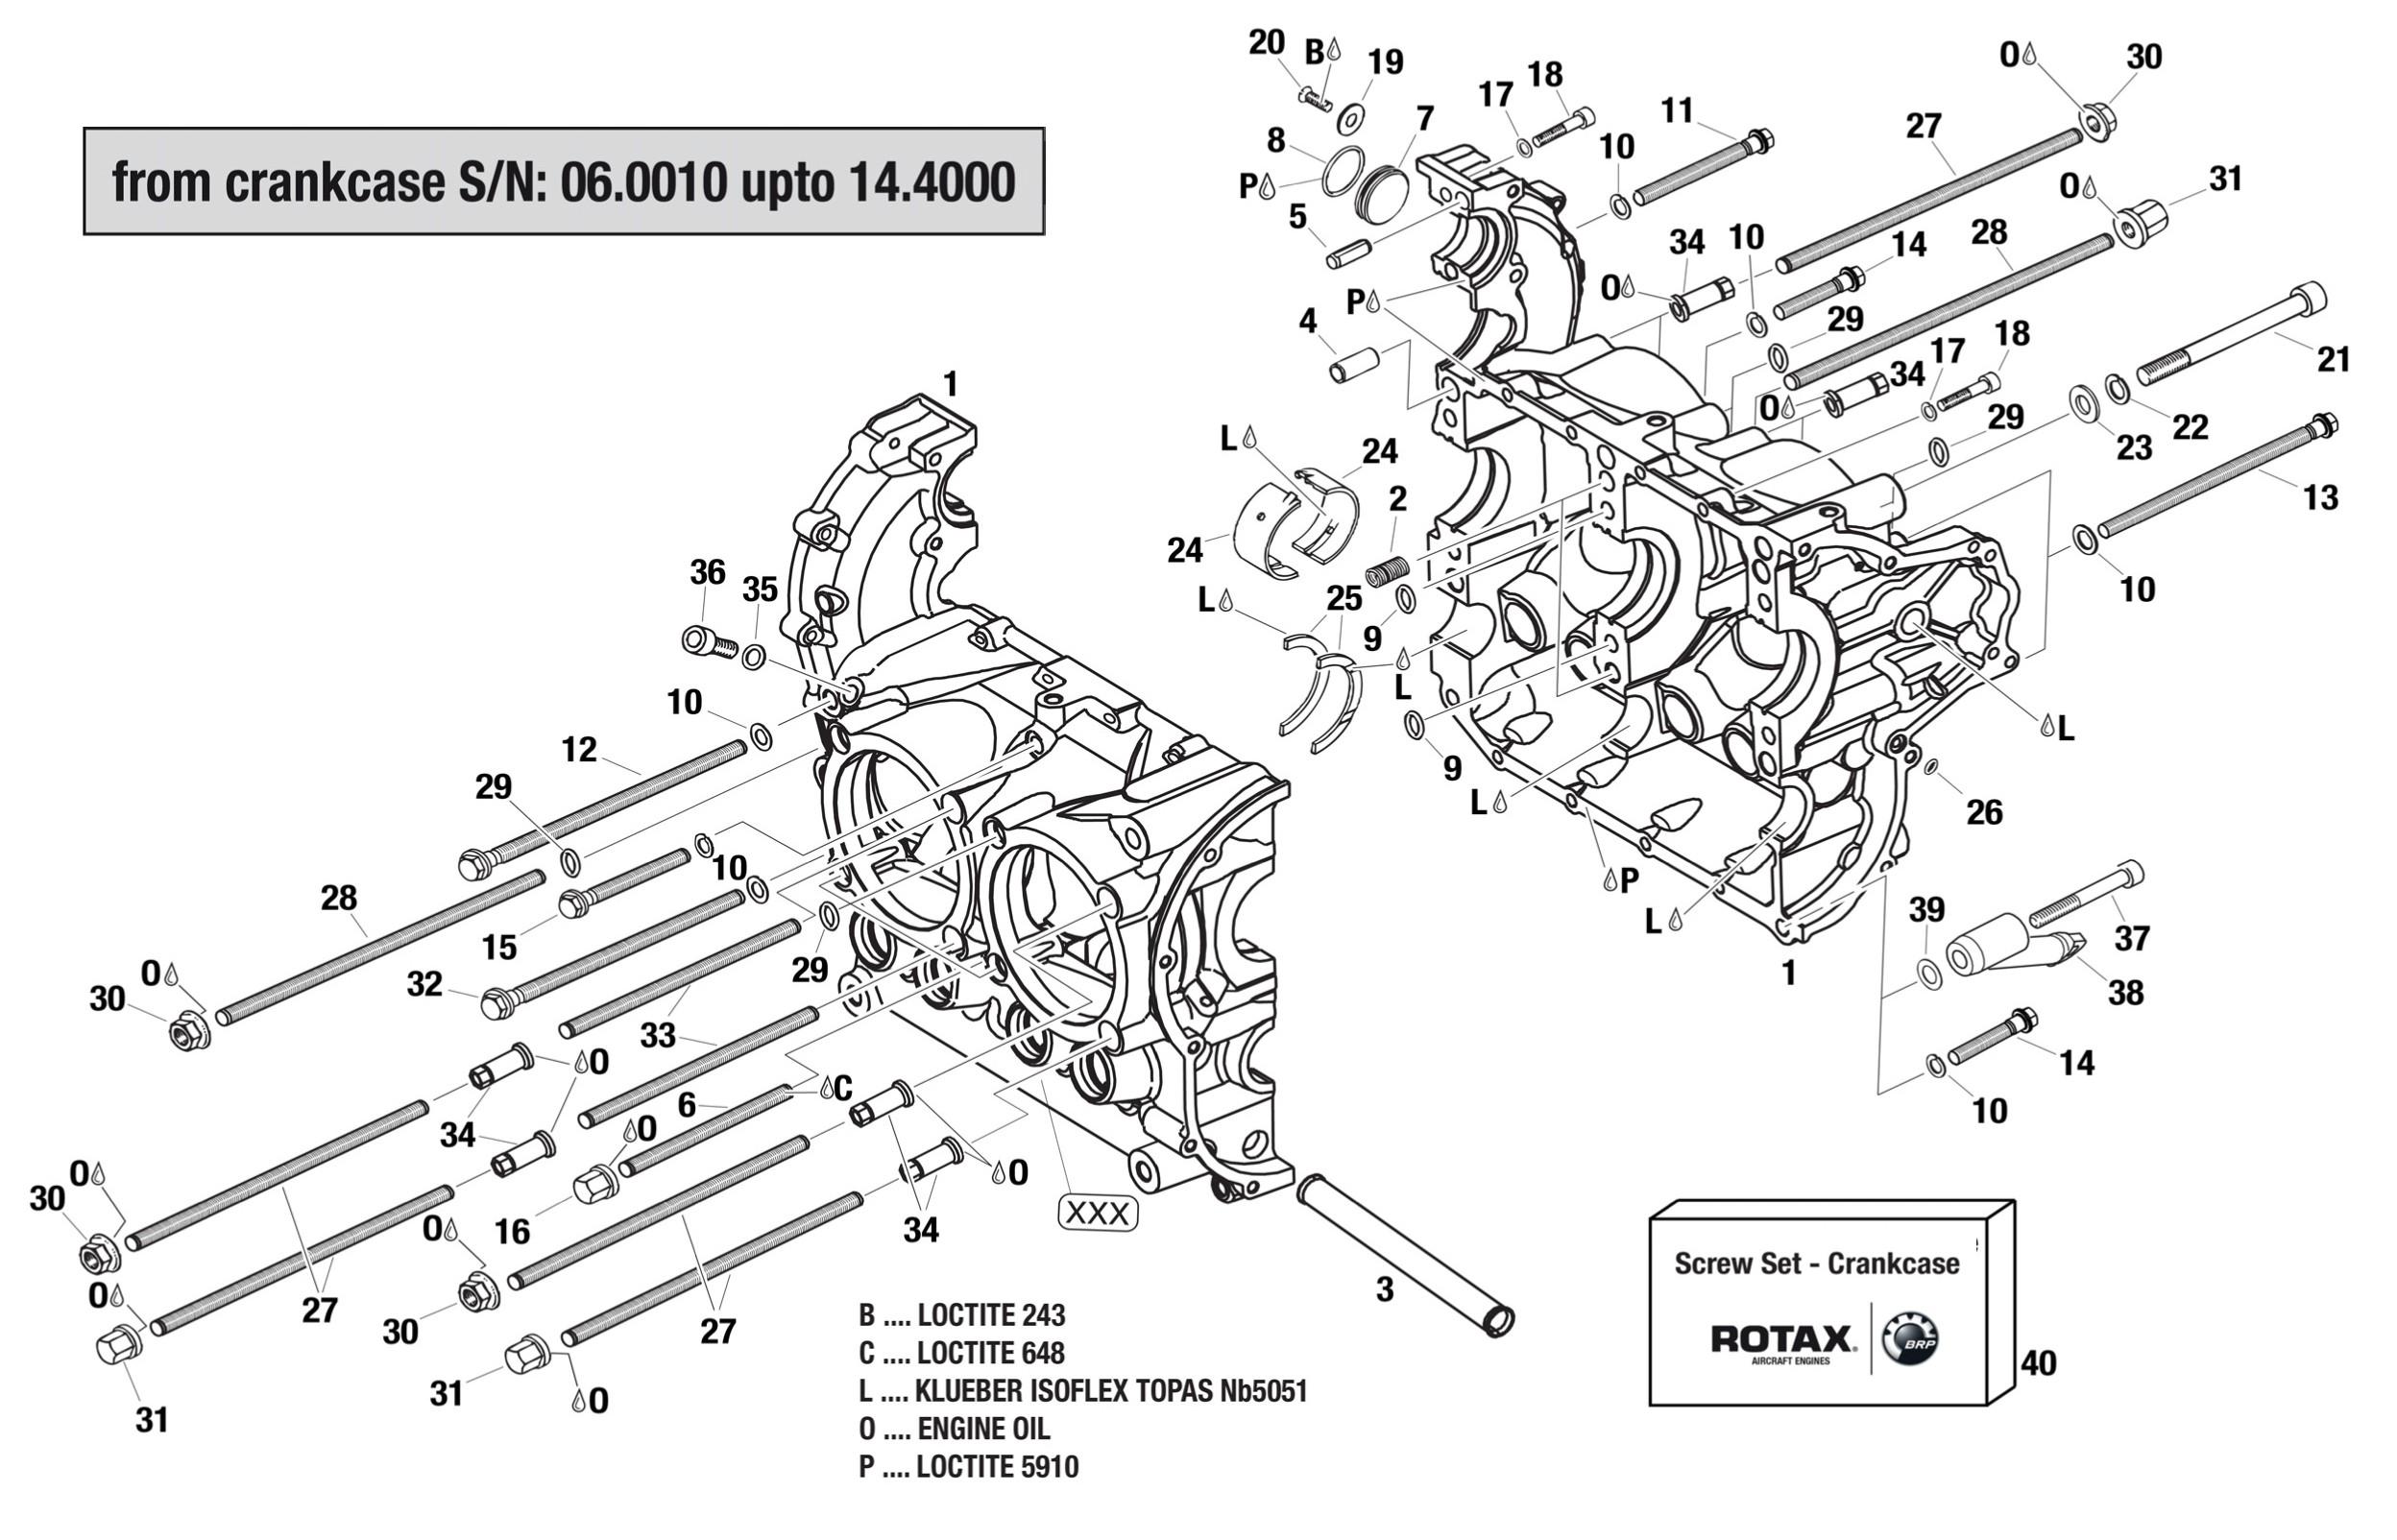 912 Amp 914 Crankcase S N 06 Up To 14